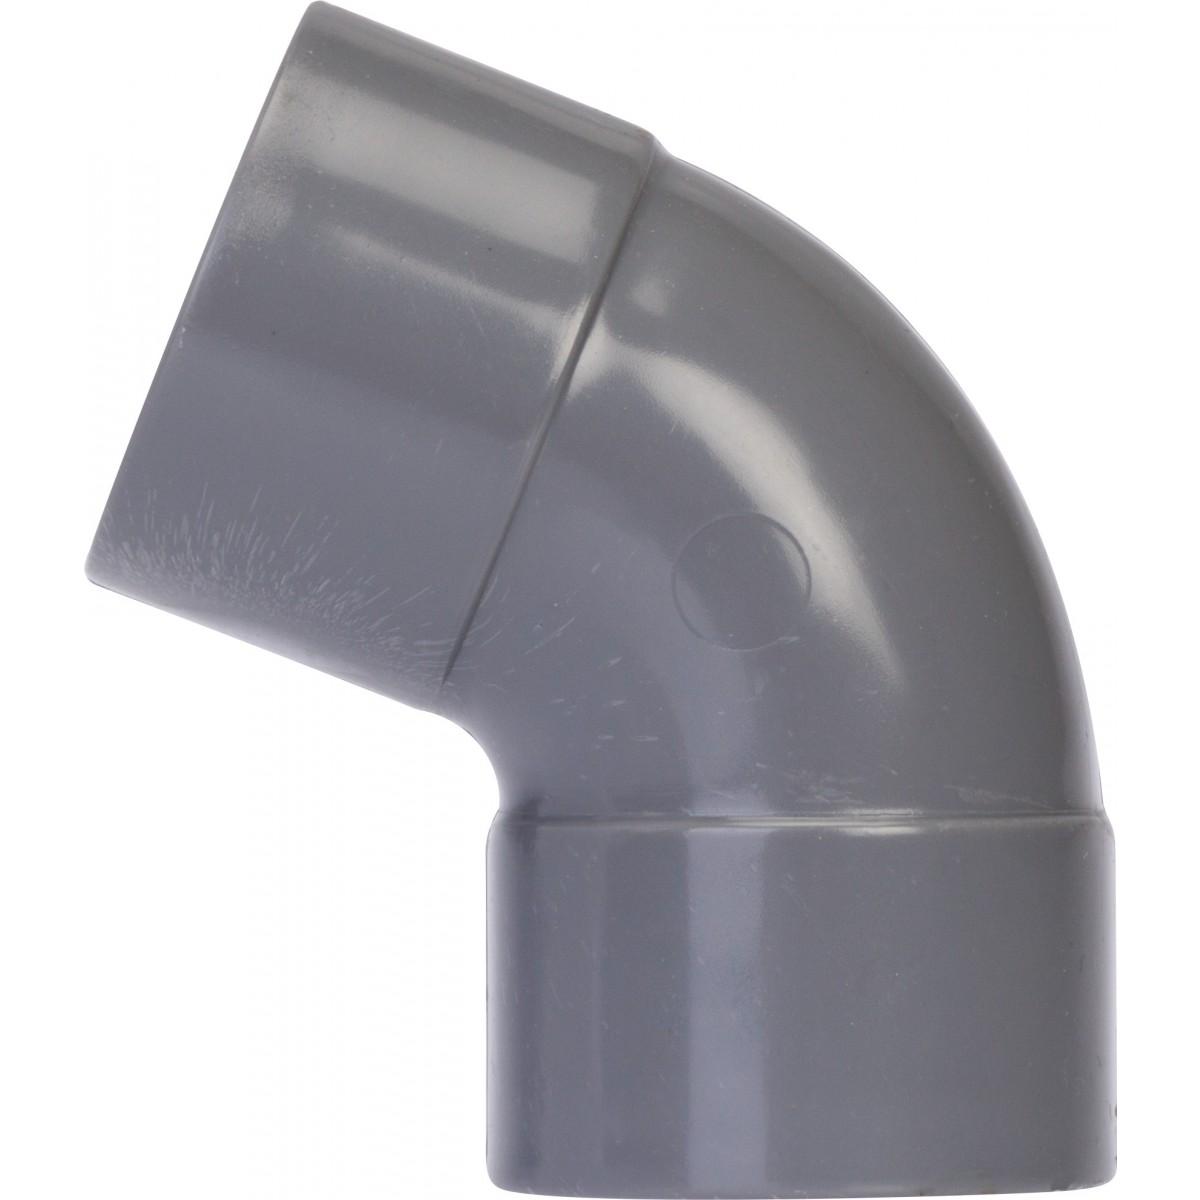 Coude à 67°30 Femelle / Femelle Girpi - Diamètre 80 mm